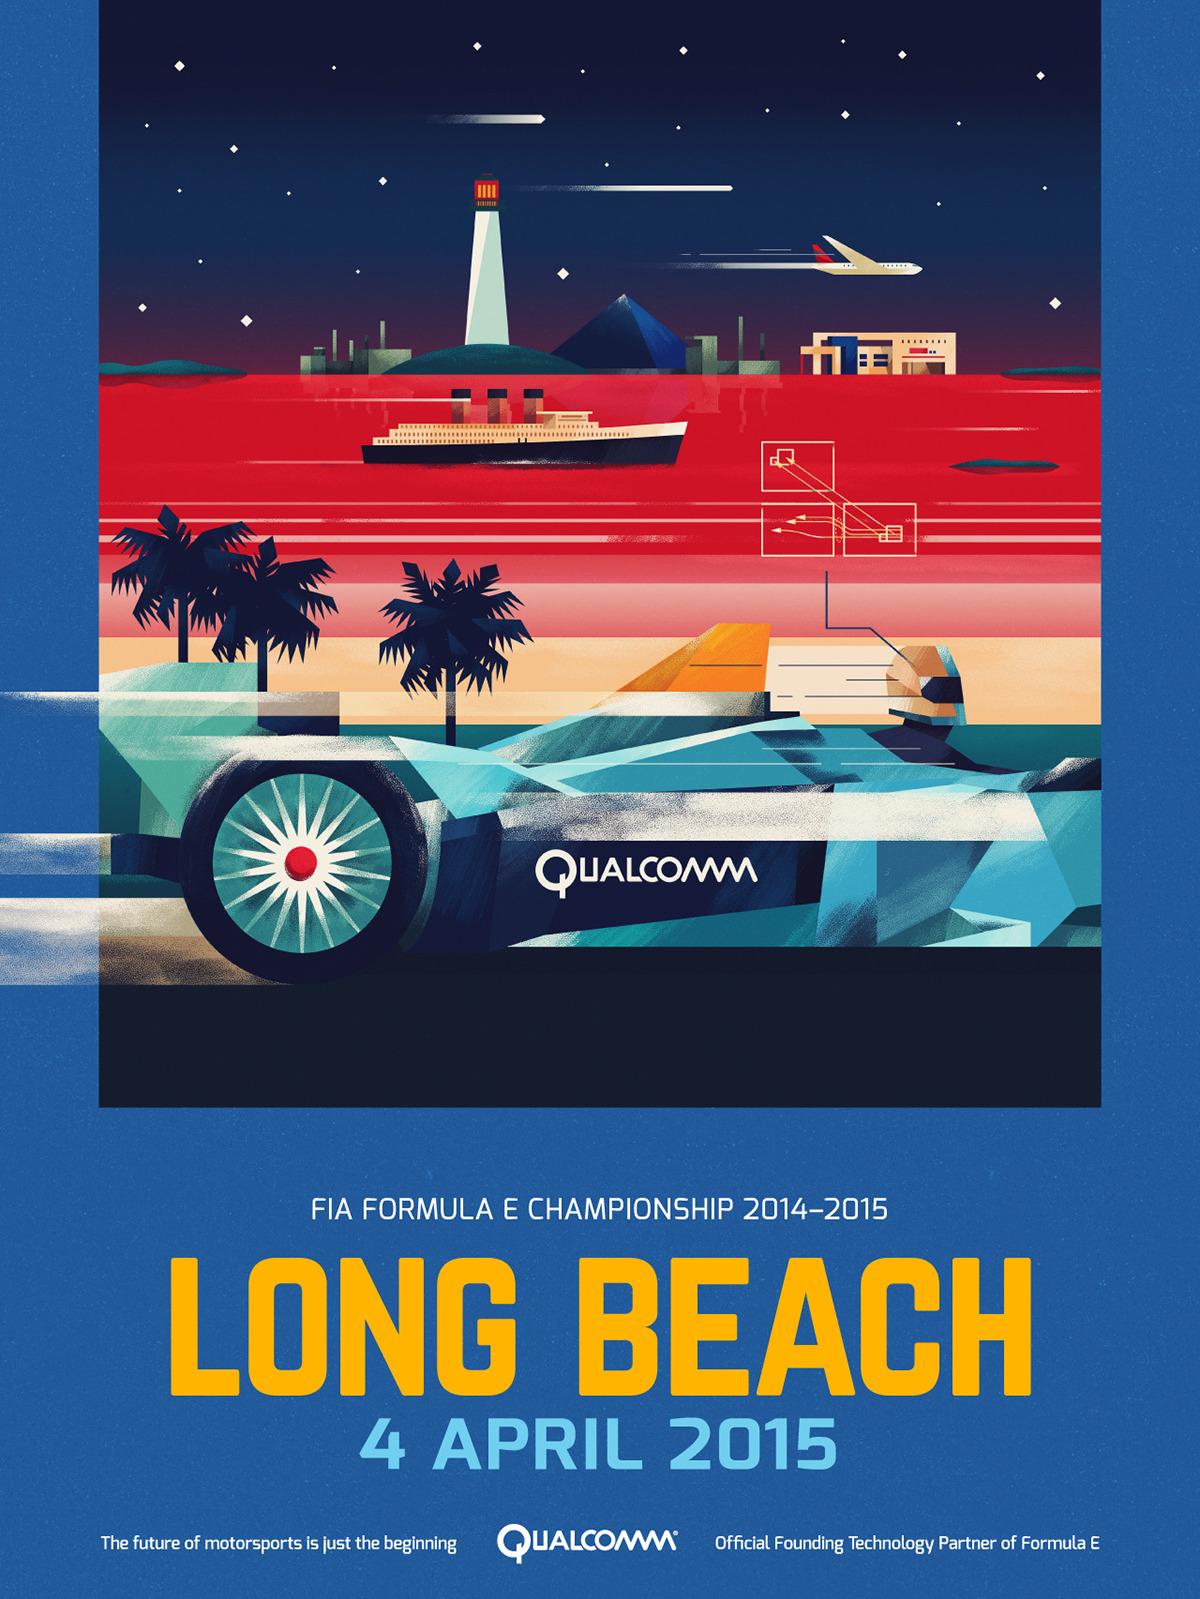 Long Beach Formula E Championship Poster by Dan Matutina